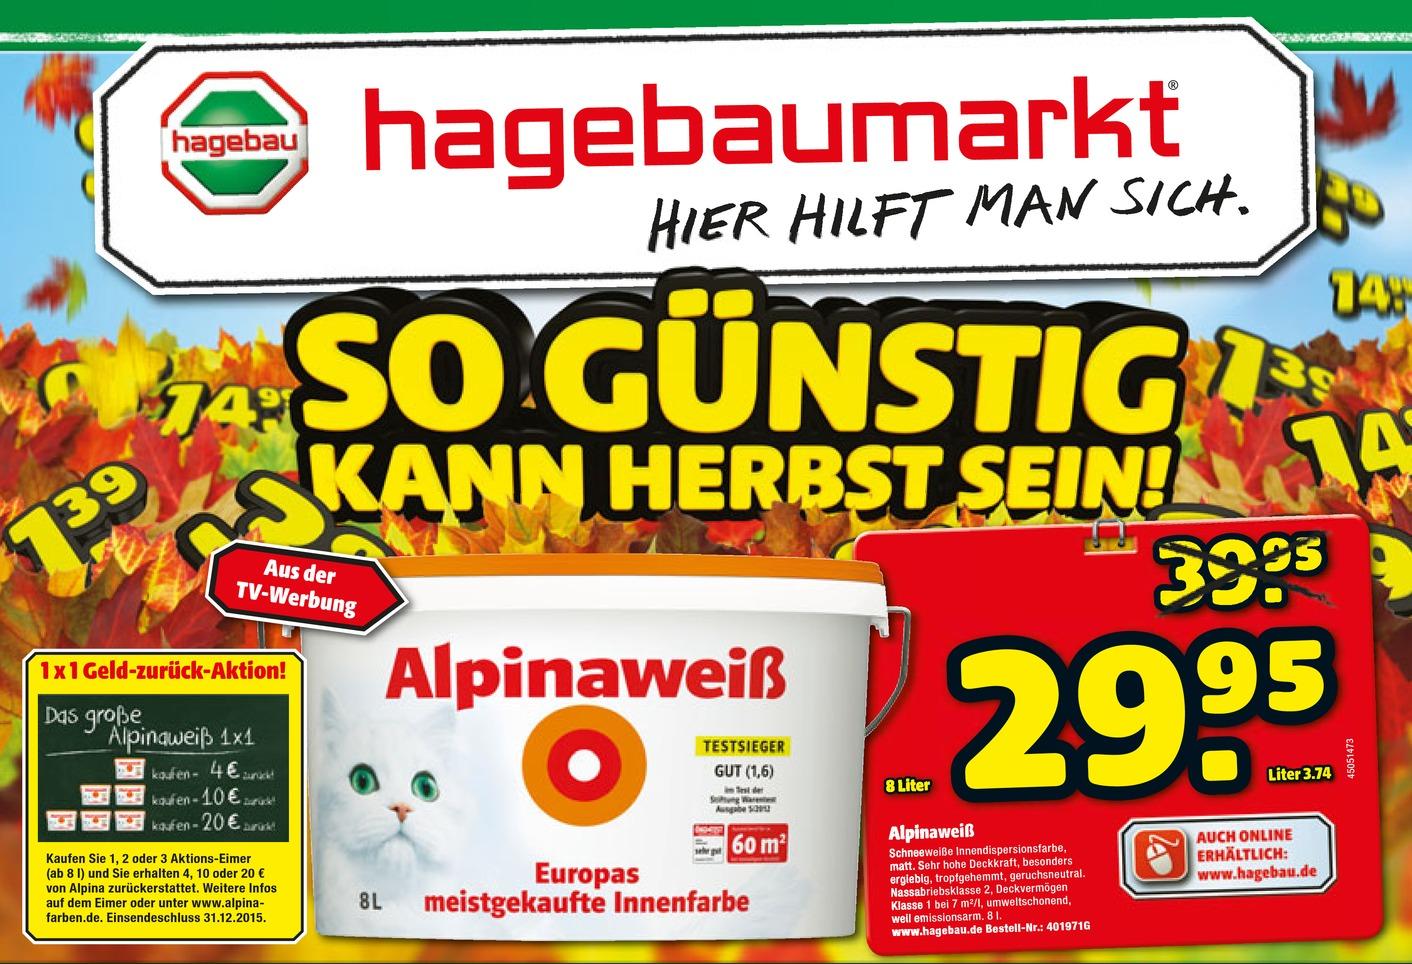 hagebge8us6.png